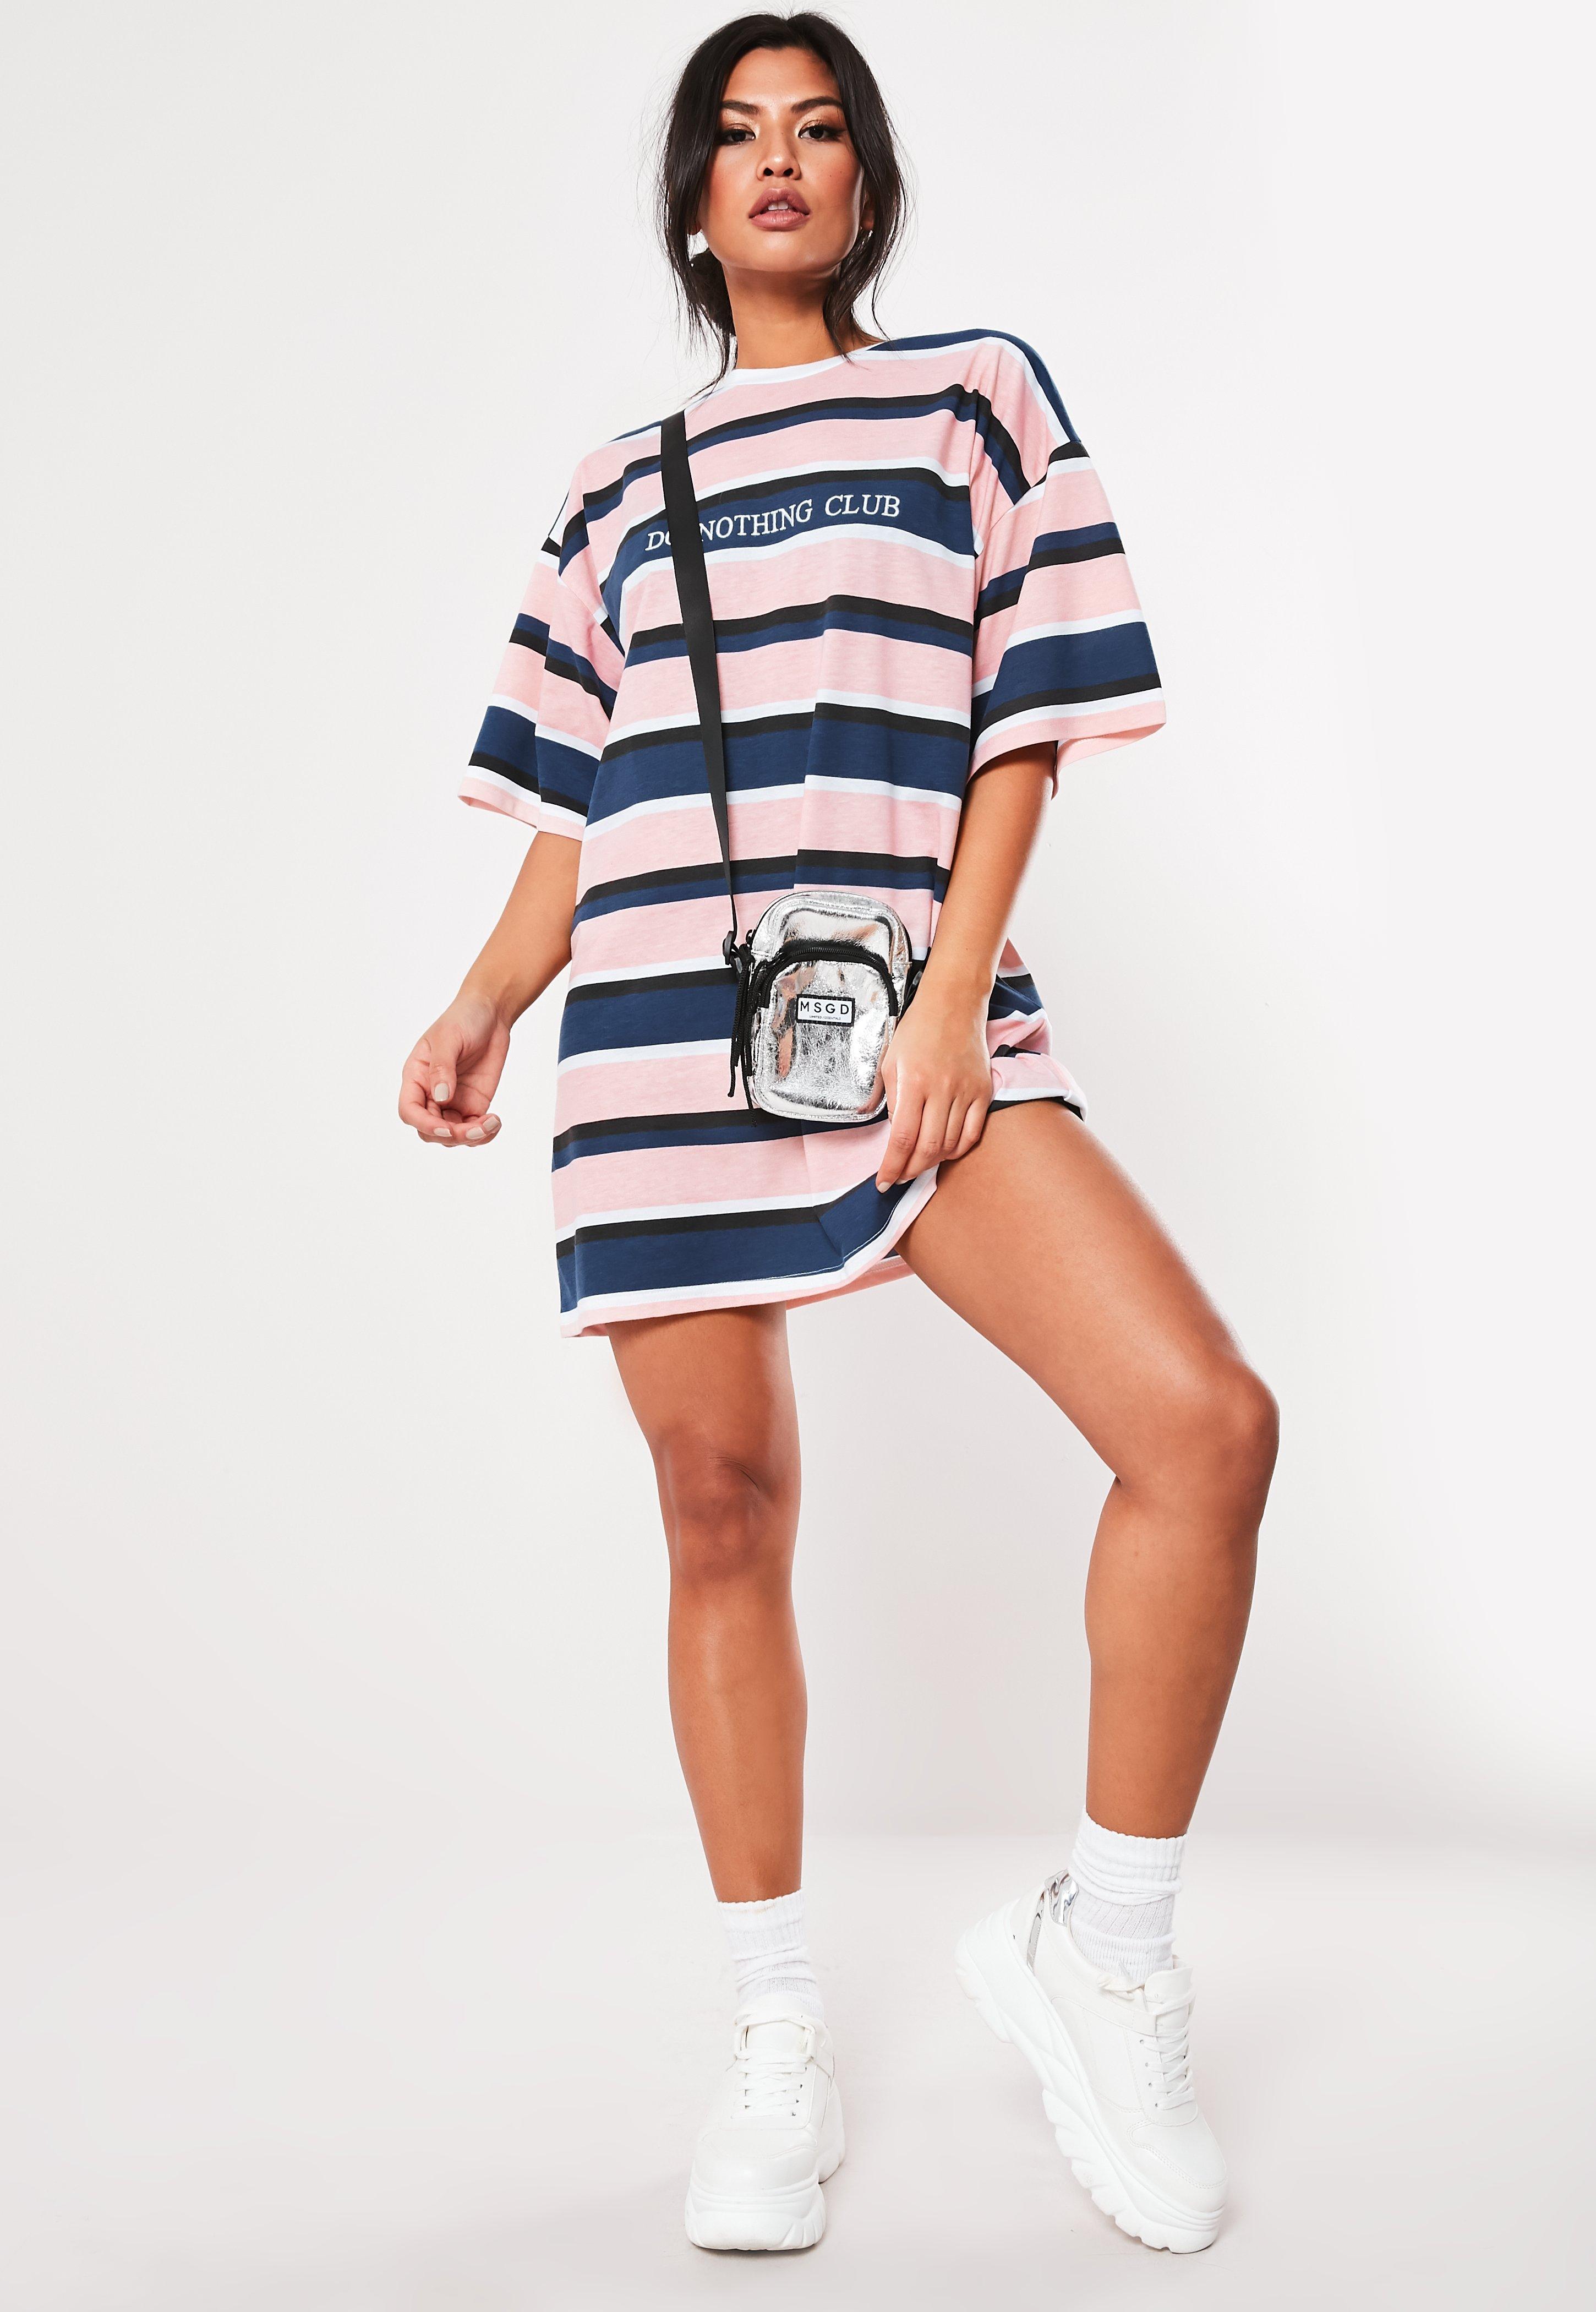 7bfc767b4fd86 T-Shirt Dresses | Printed & Slogan Dresses - Missguided